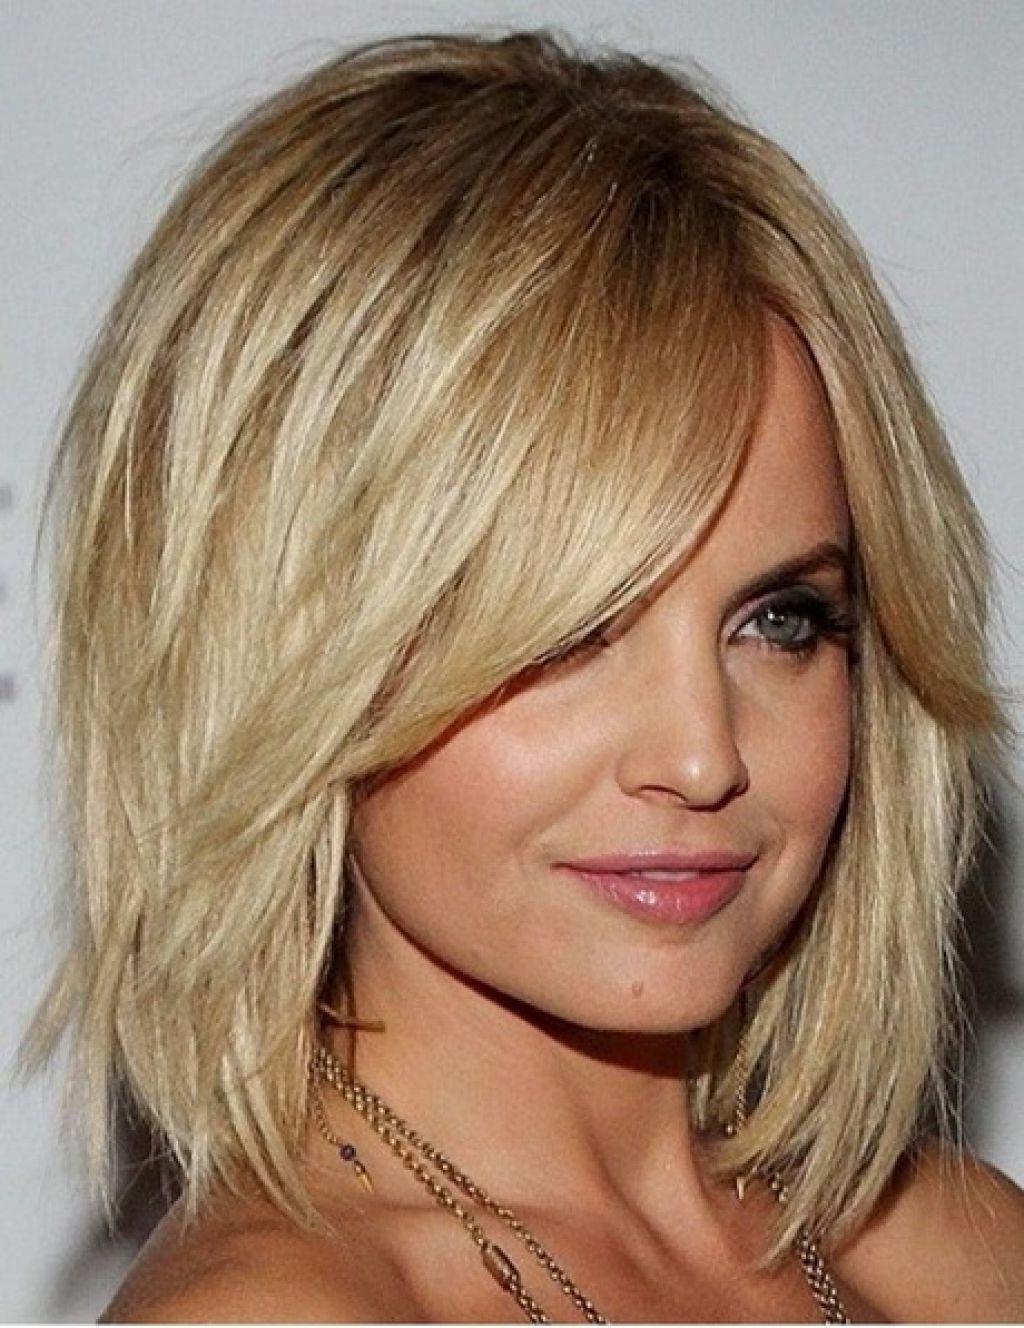 Hair Cuts : Mid Length Haircuts For Fine Hair Choppy Medium Ideas Within Well Liked Medium Haircuts For Fine Hair Oval Face (View 3 of 20)